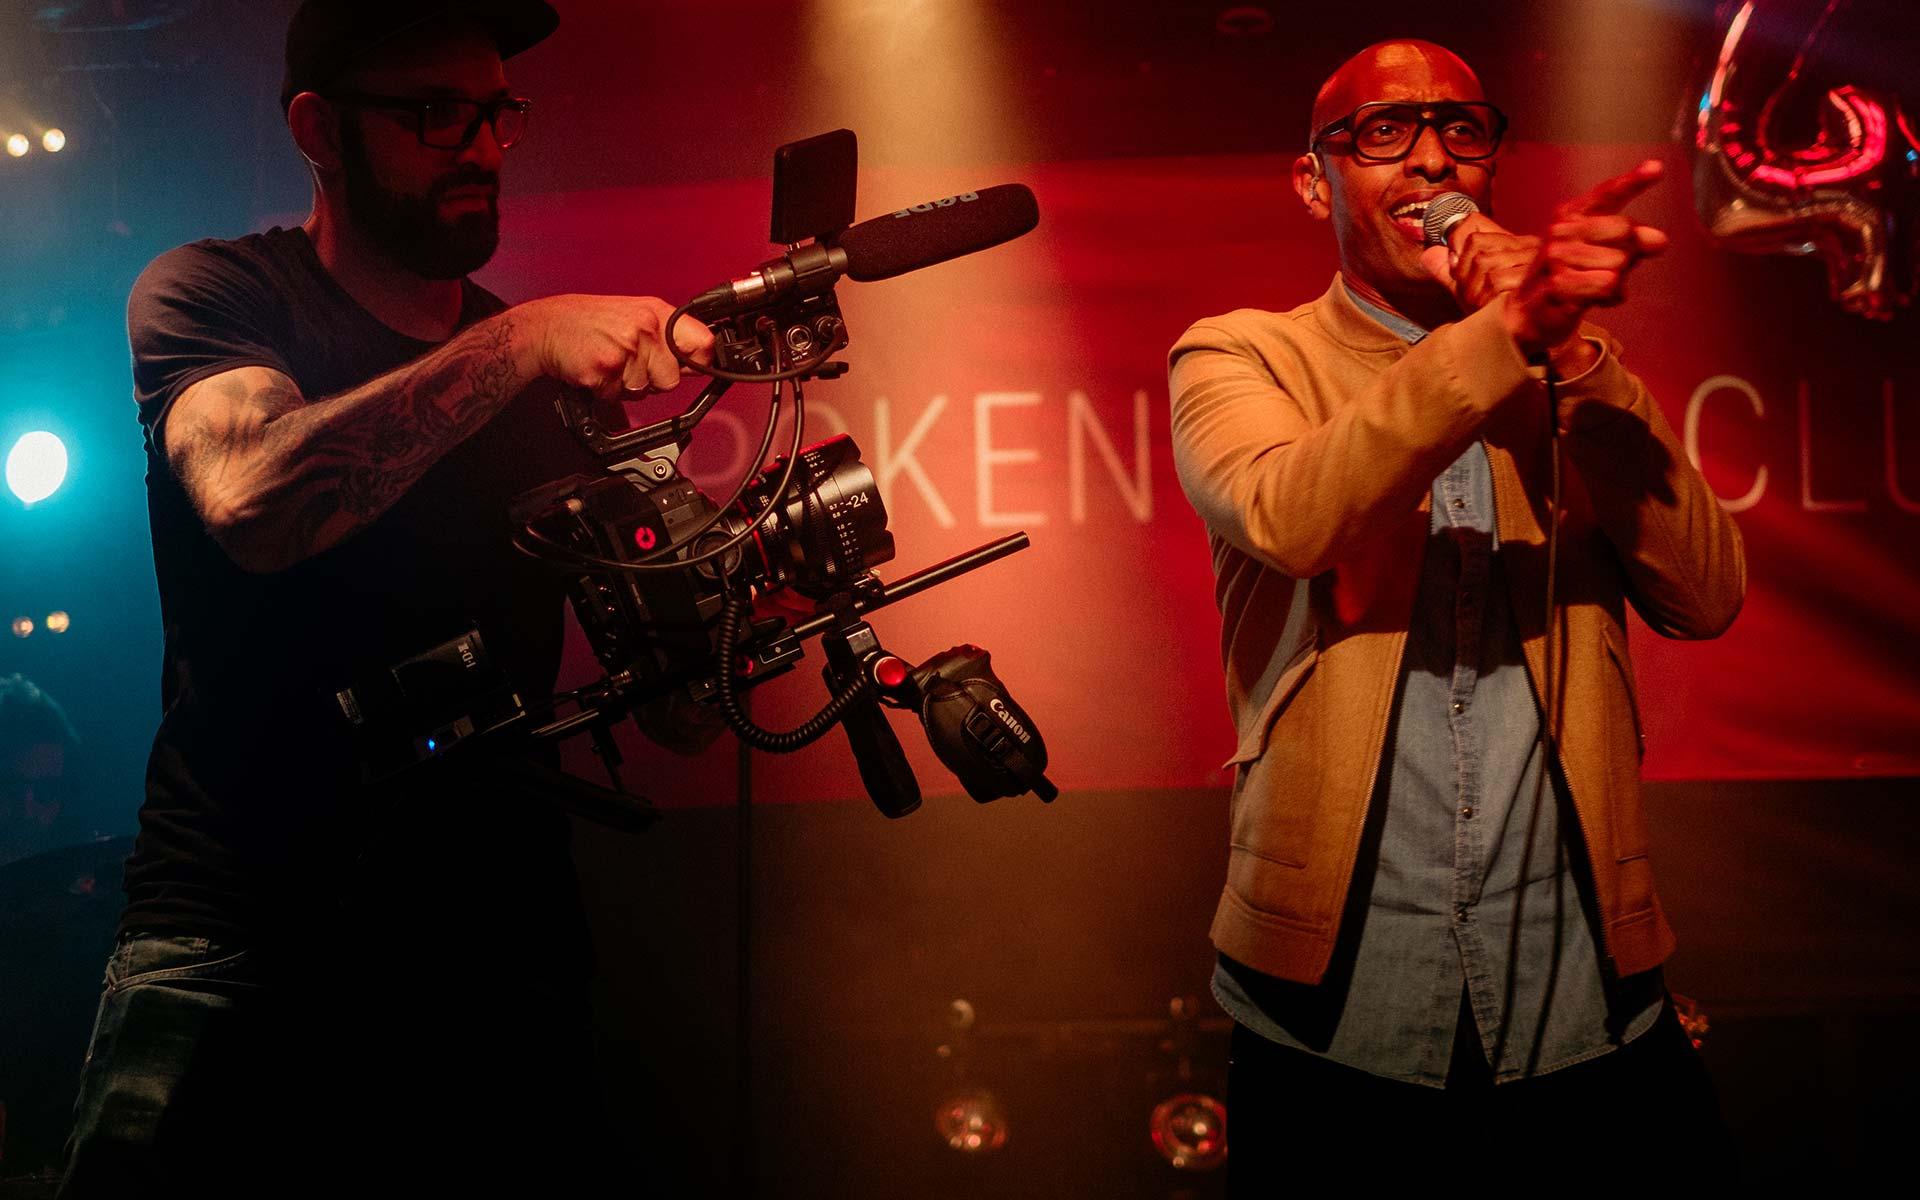 AMIAZ Event- und TV- Moderation Köln